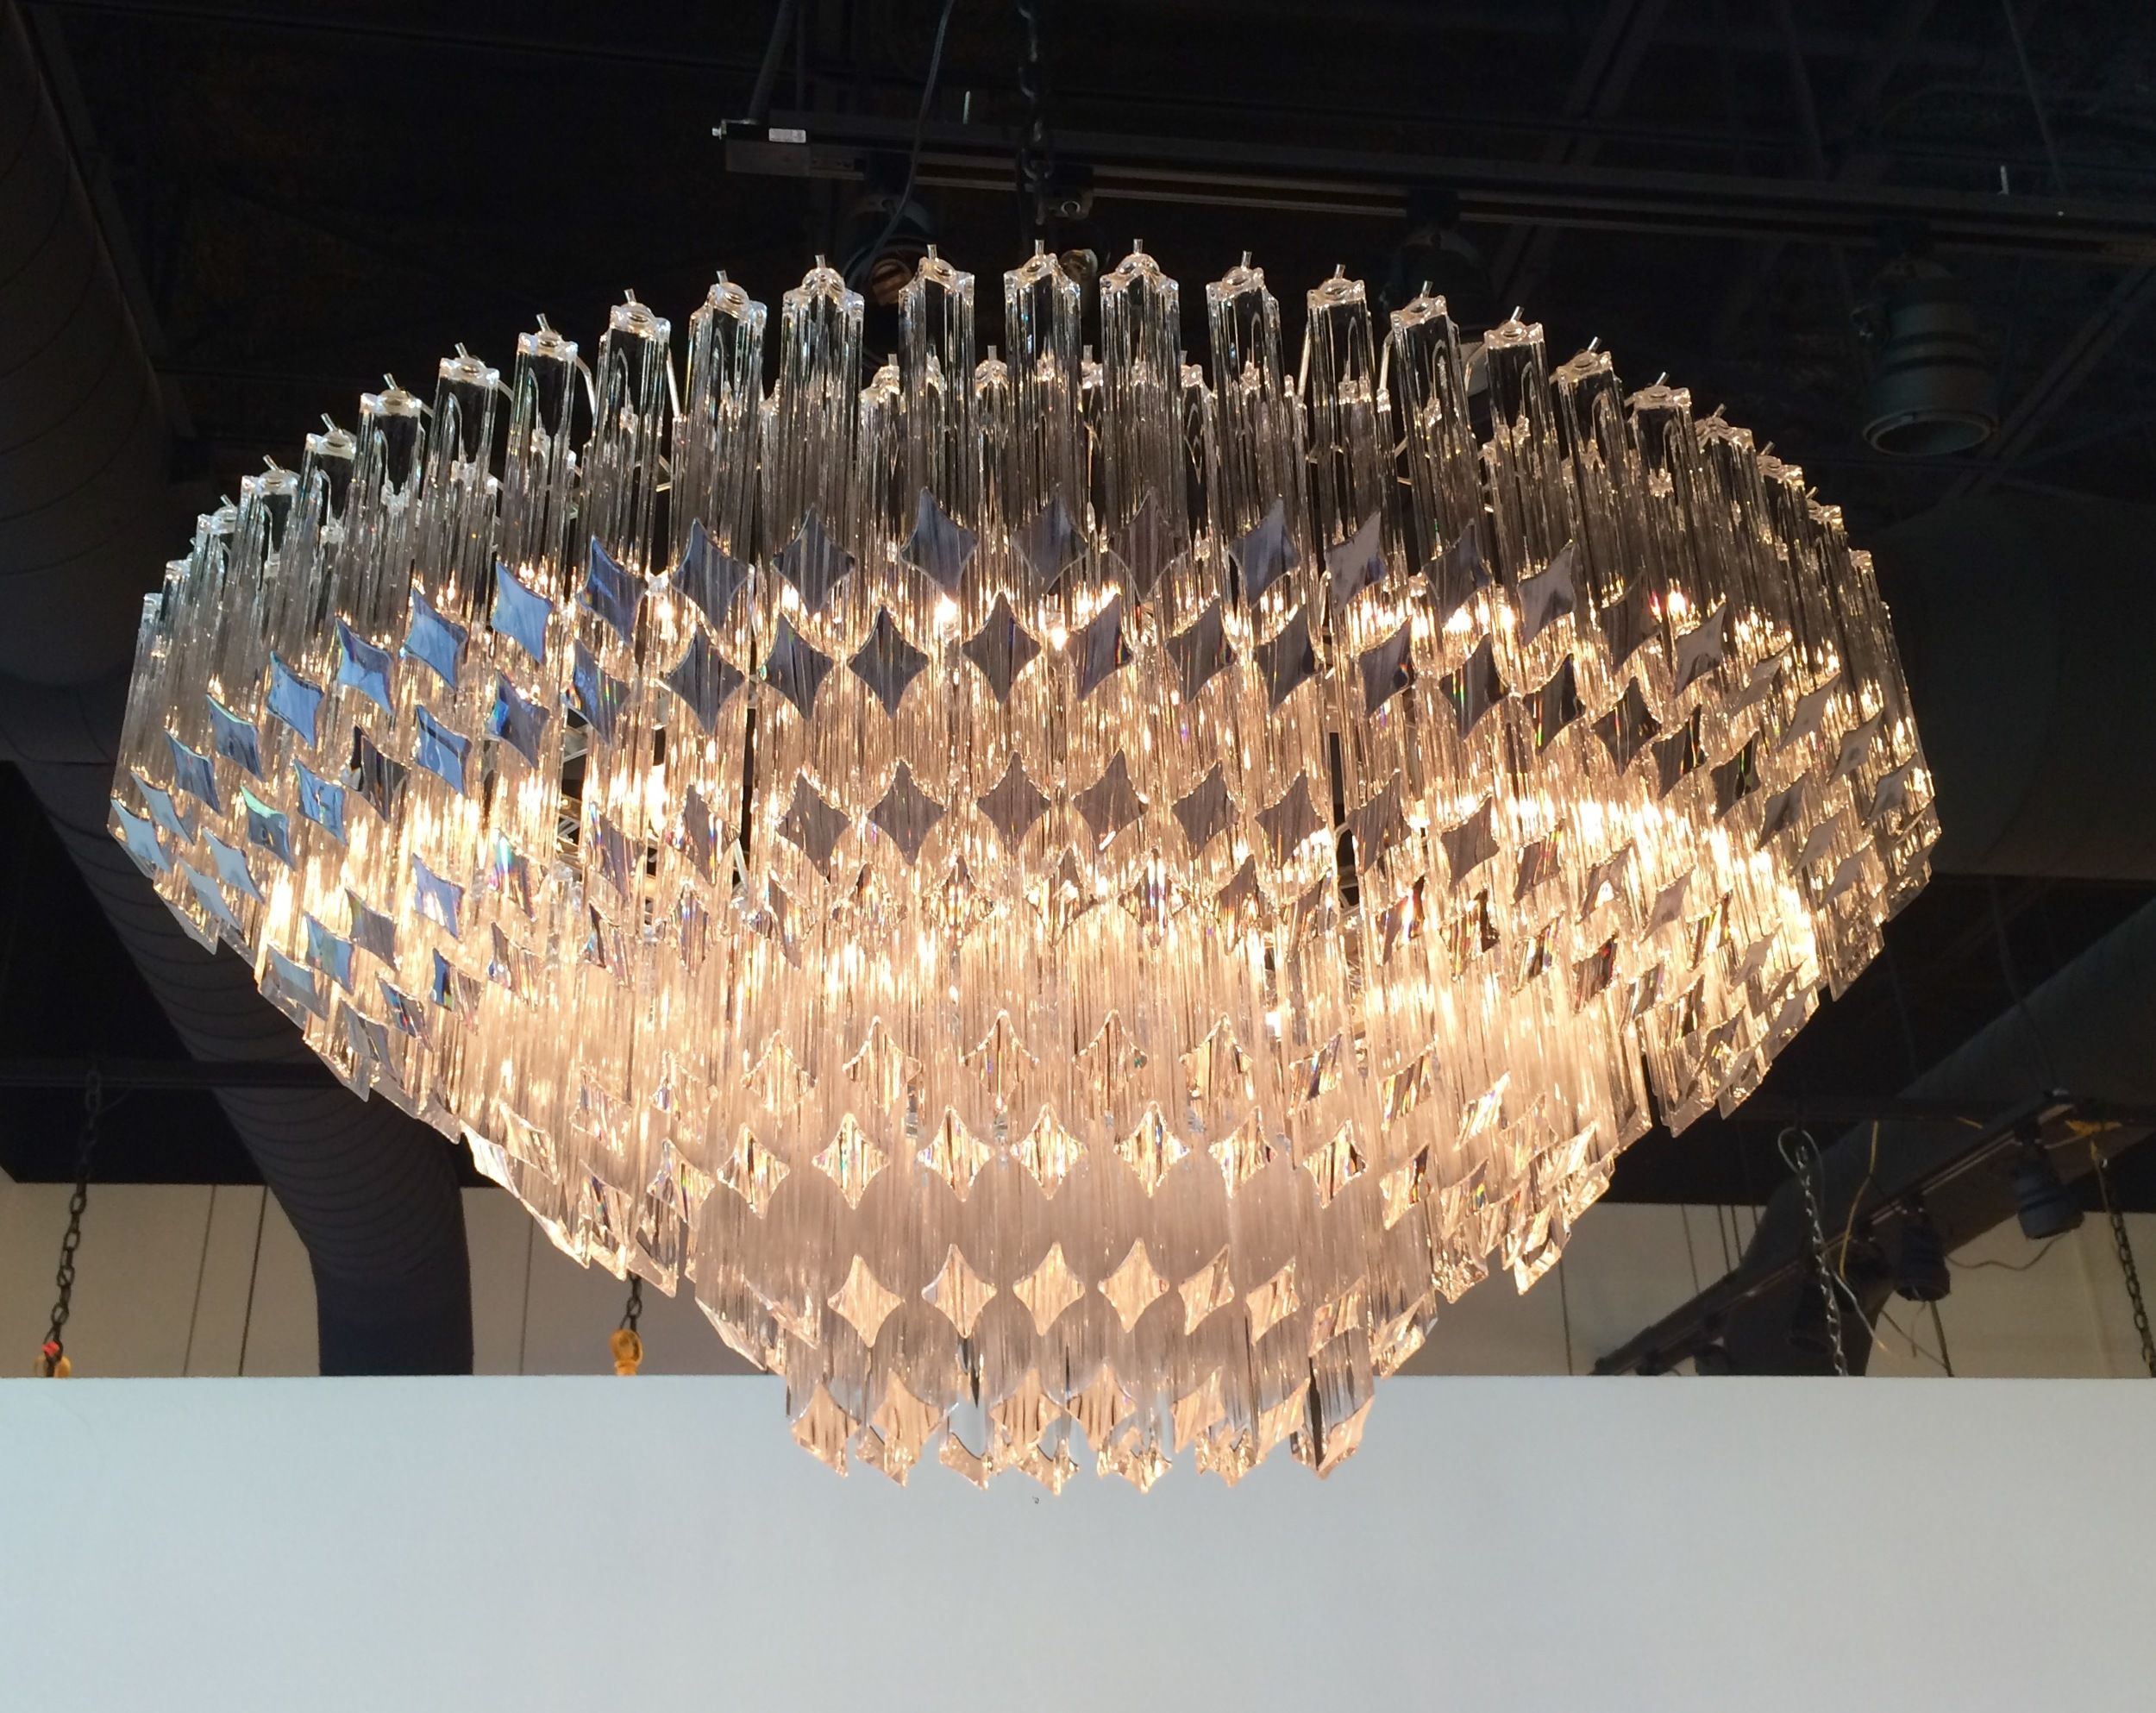 Mid 20th Century Oval Venini Crystal Chandelier Crystal